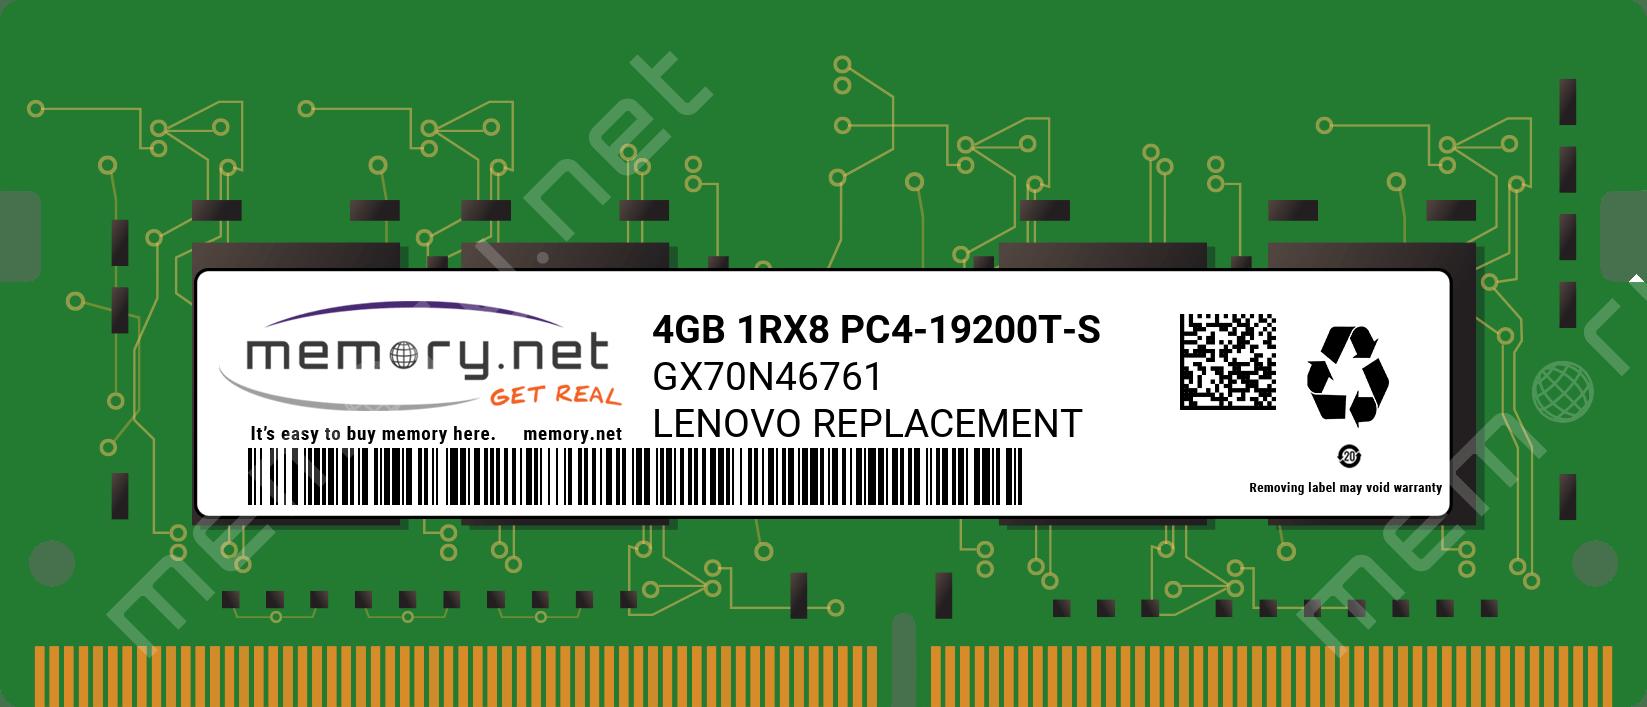 GX70N46761